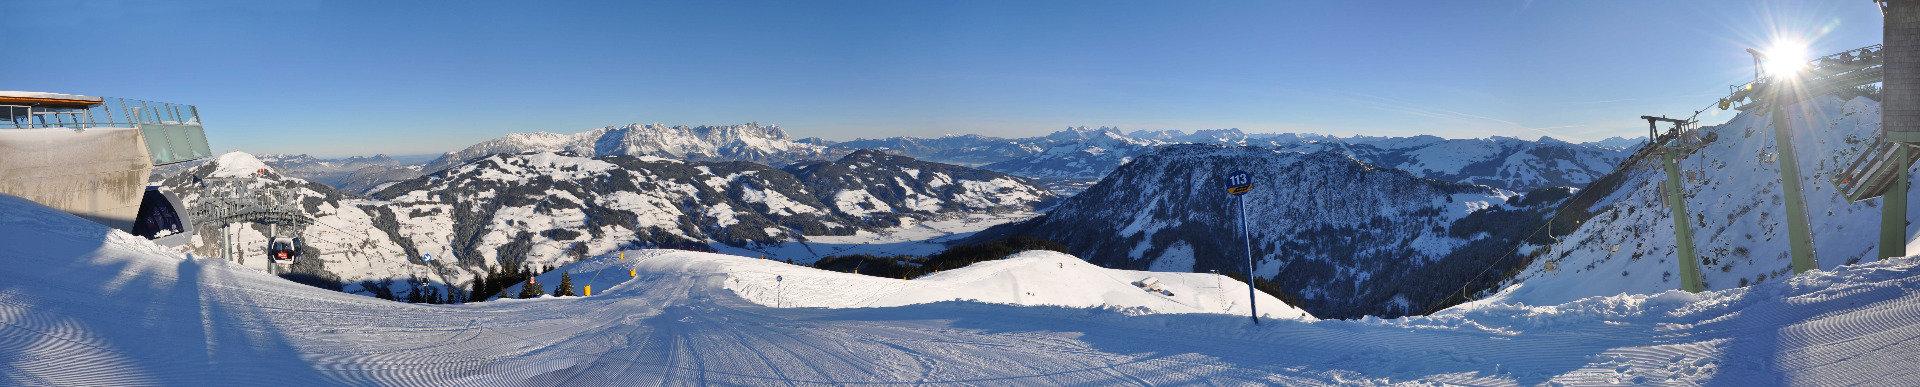 Panorama in der SkiWelt - © Christian Kapfinger